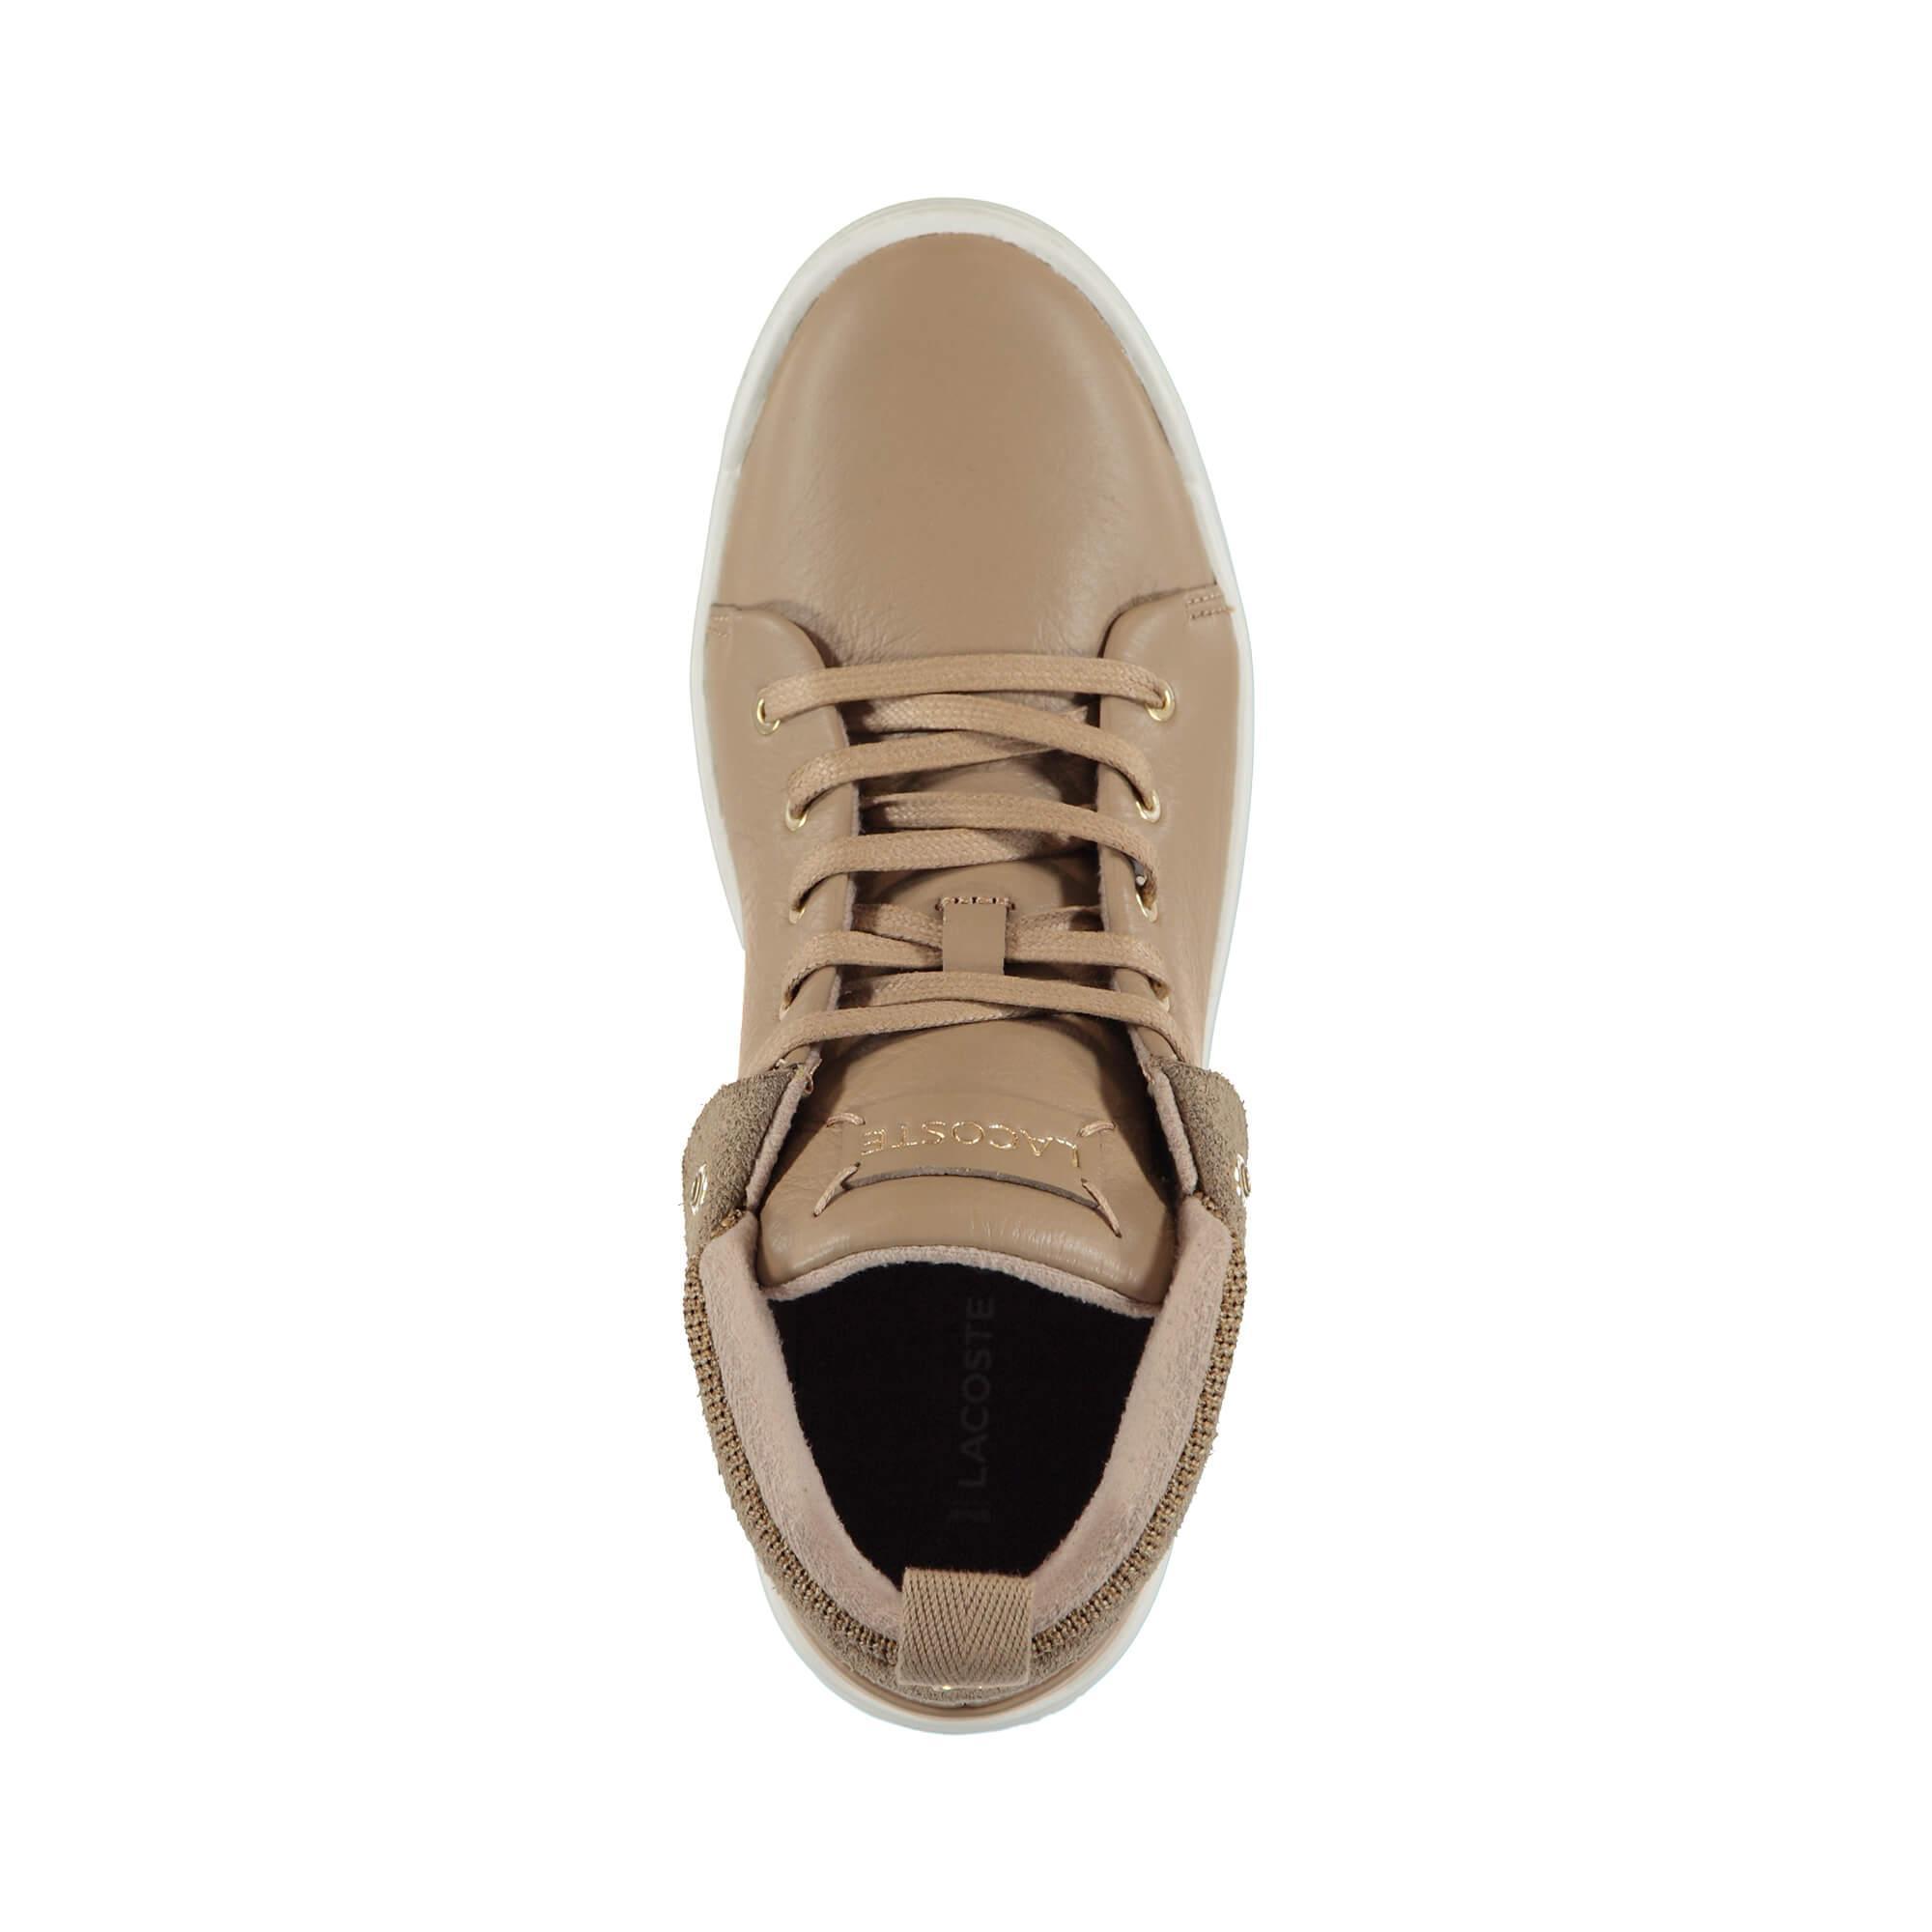 Lacoste Explorateur Classic 318 1 Damskie Boots